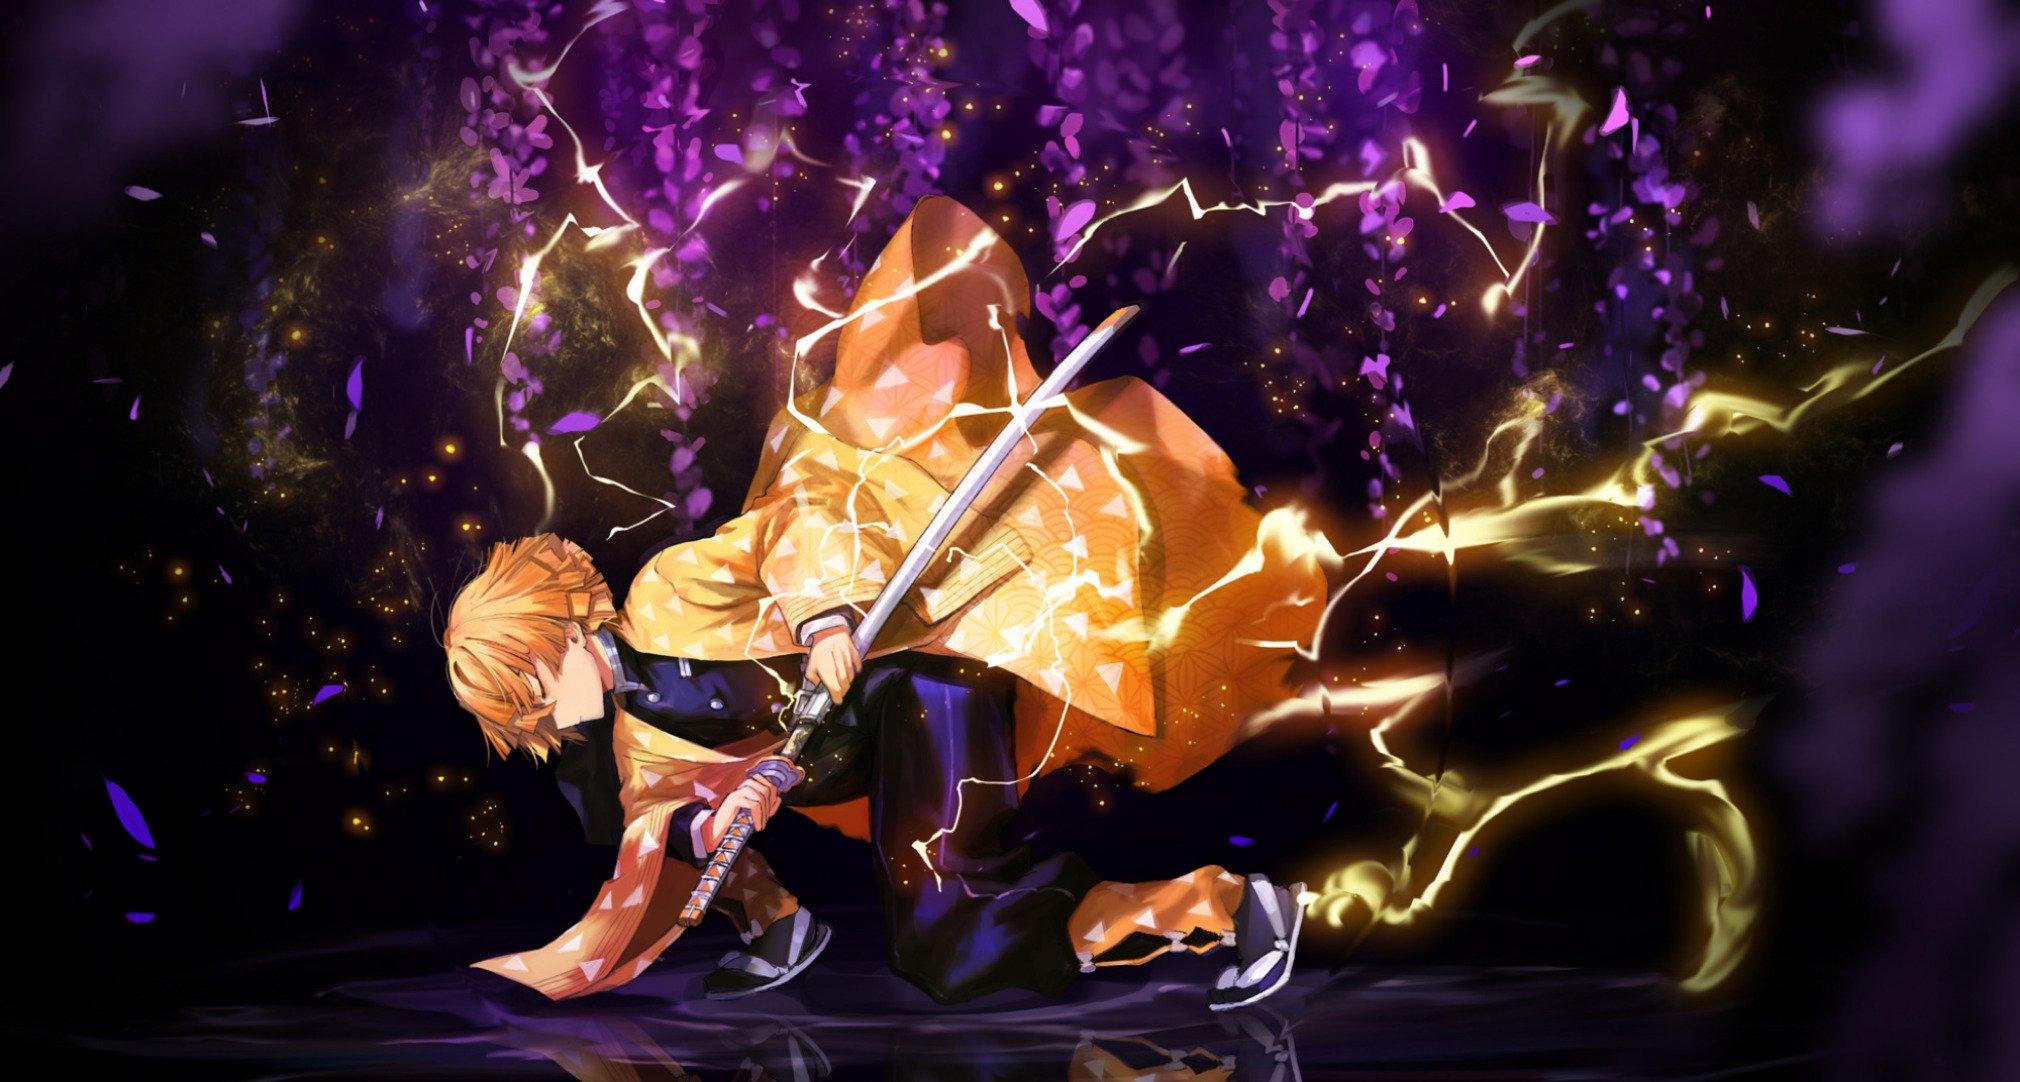 Fondos de pantalla Anime Zenitsu Agatsuma con espada de Guardianes de la Noche